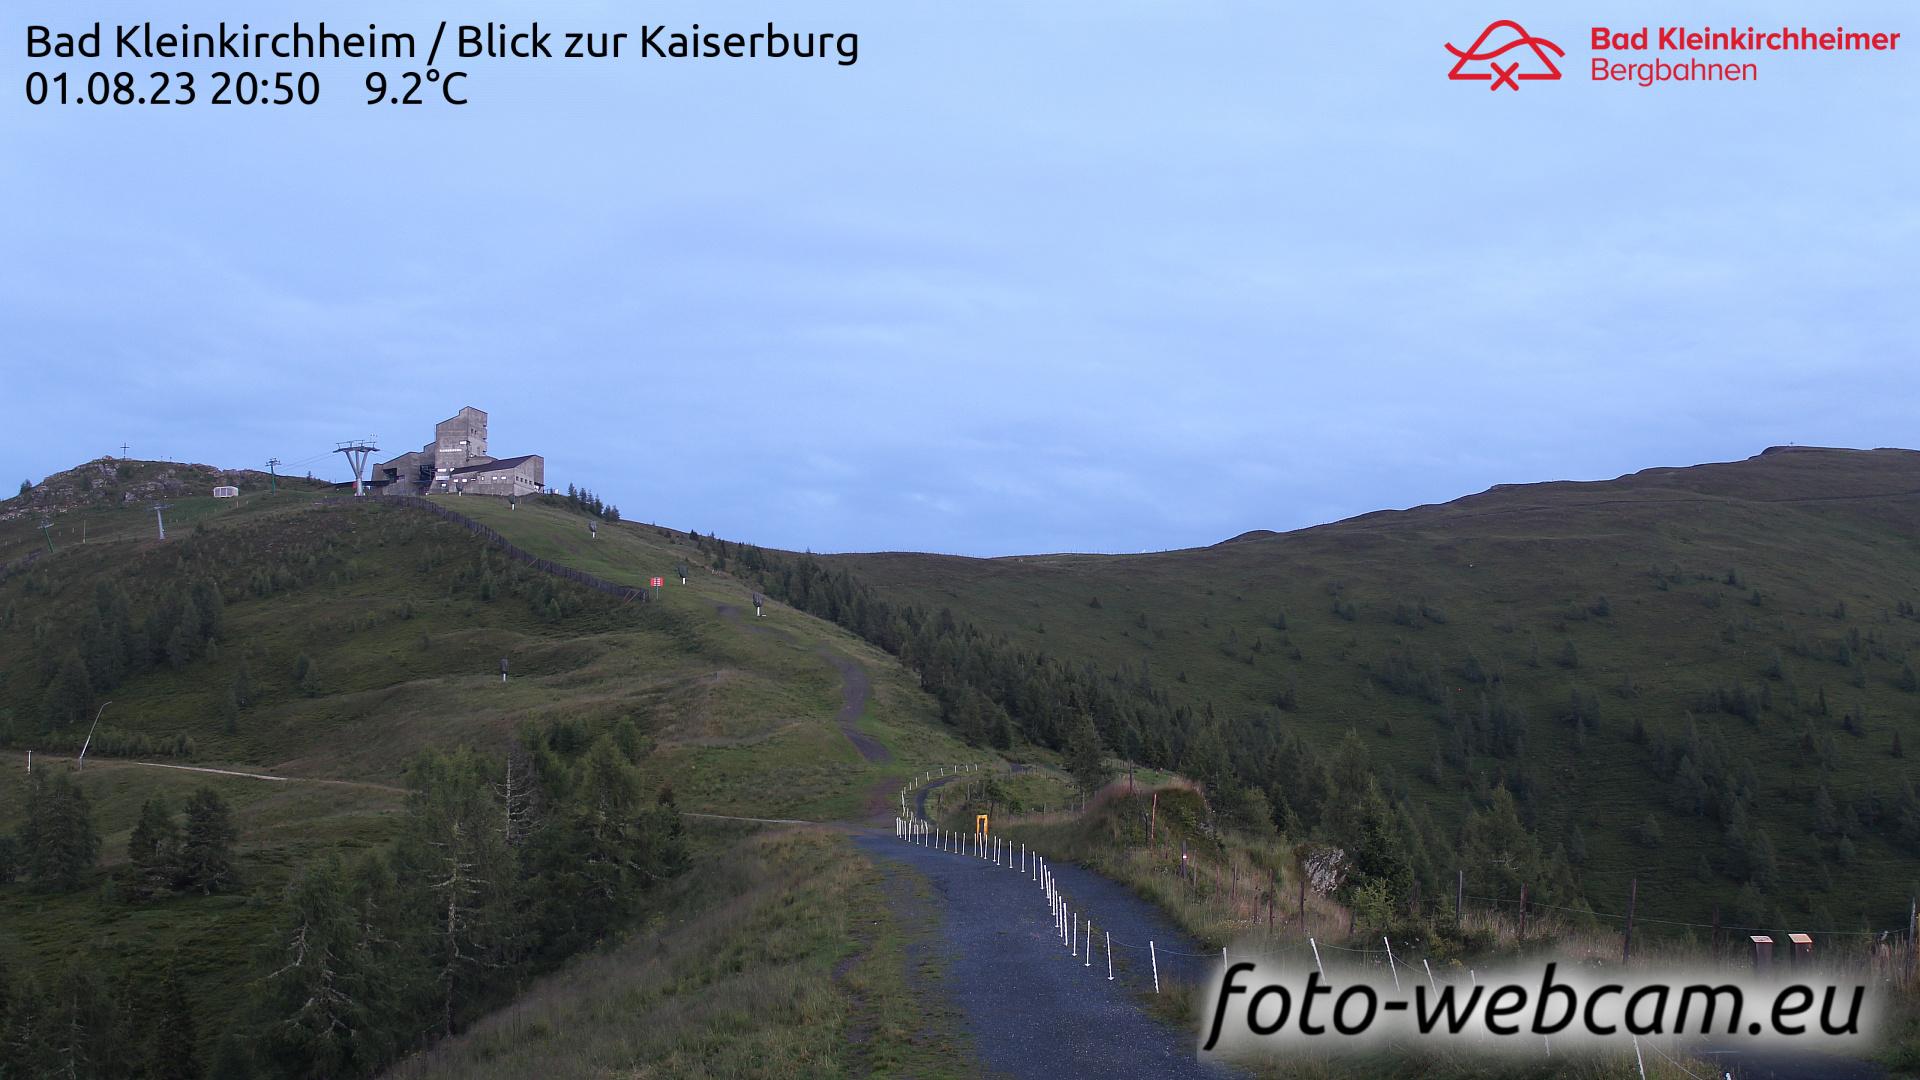 Bad Kleinkirchheim Thu. 20:23